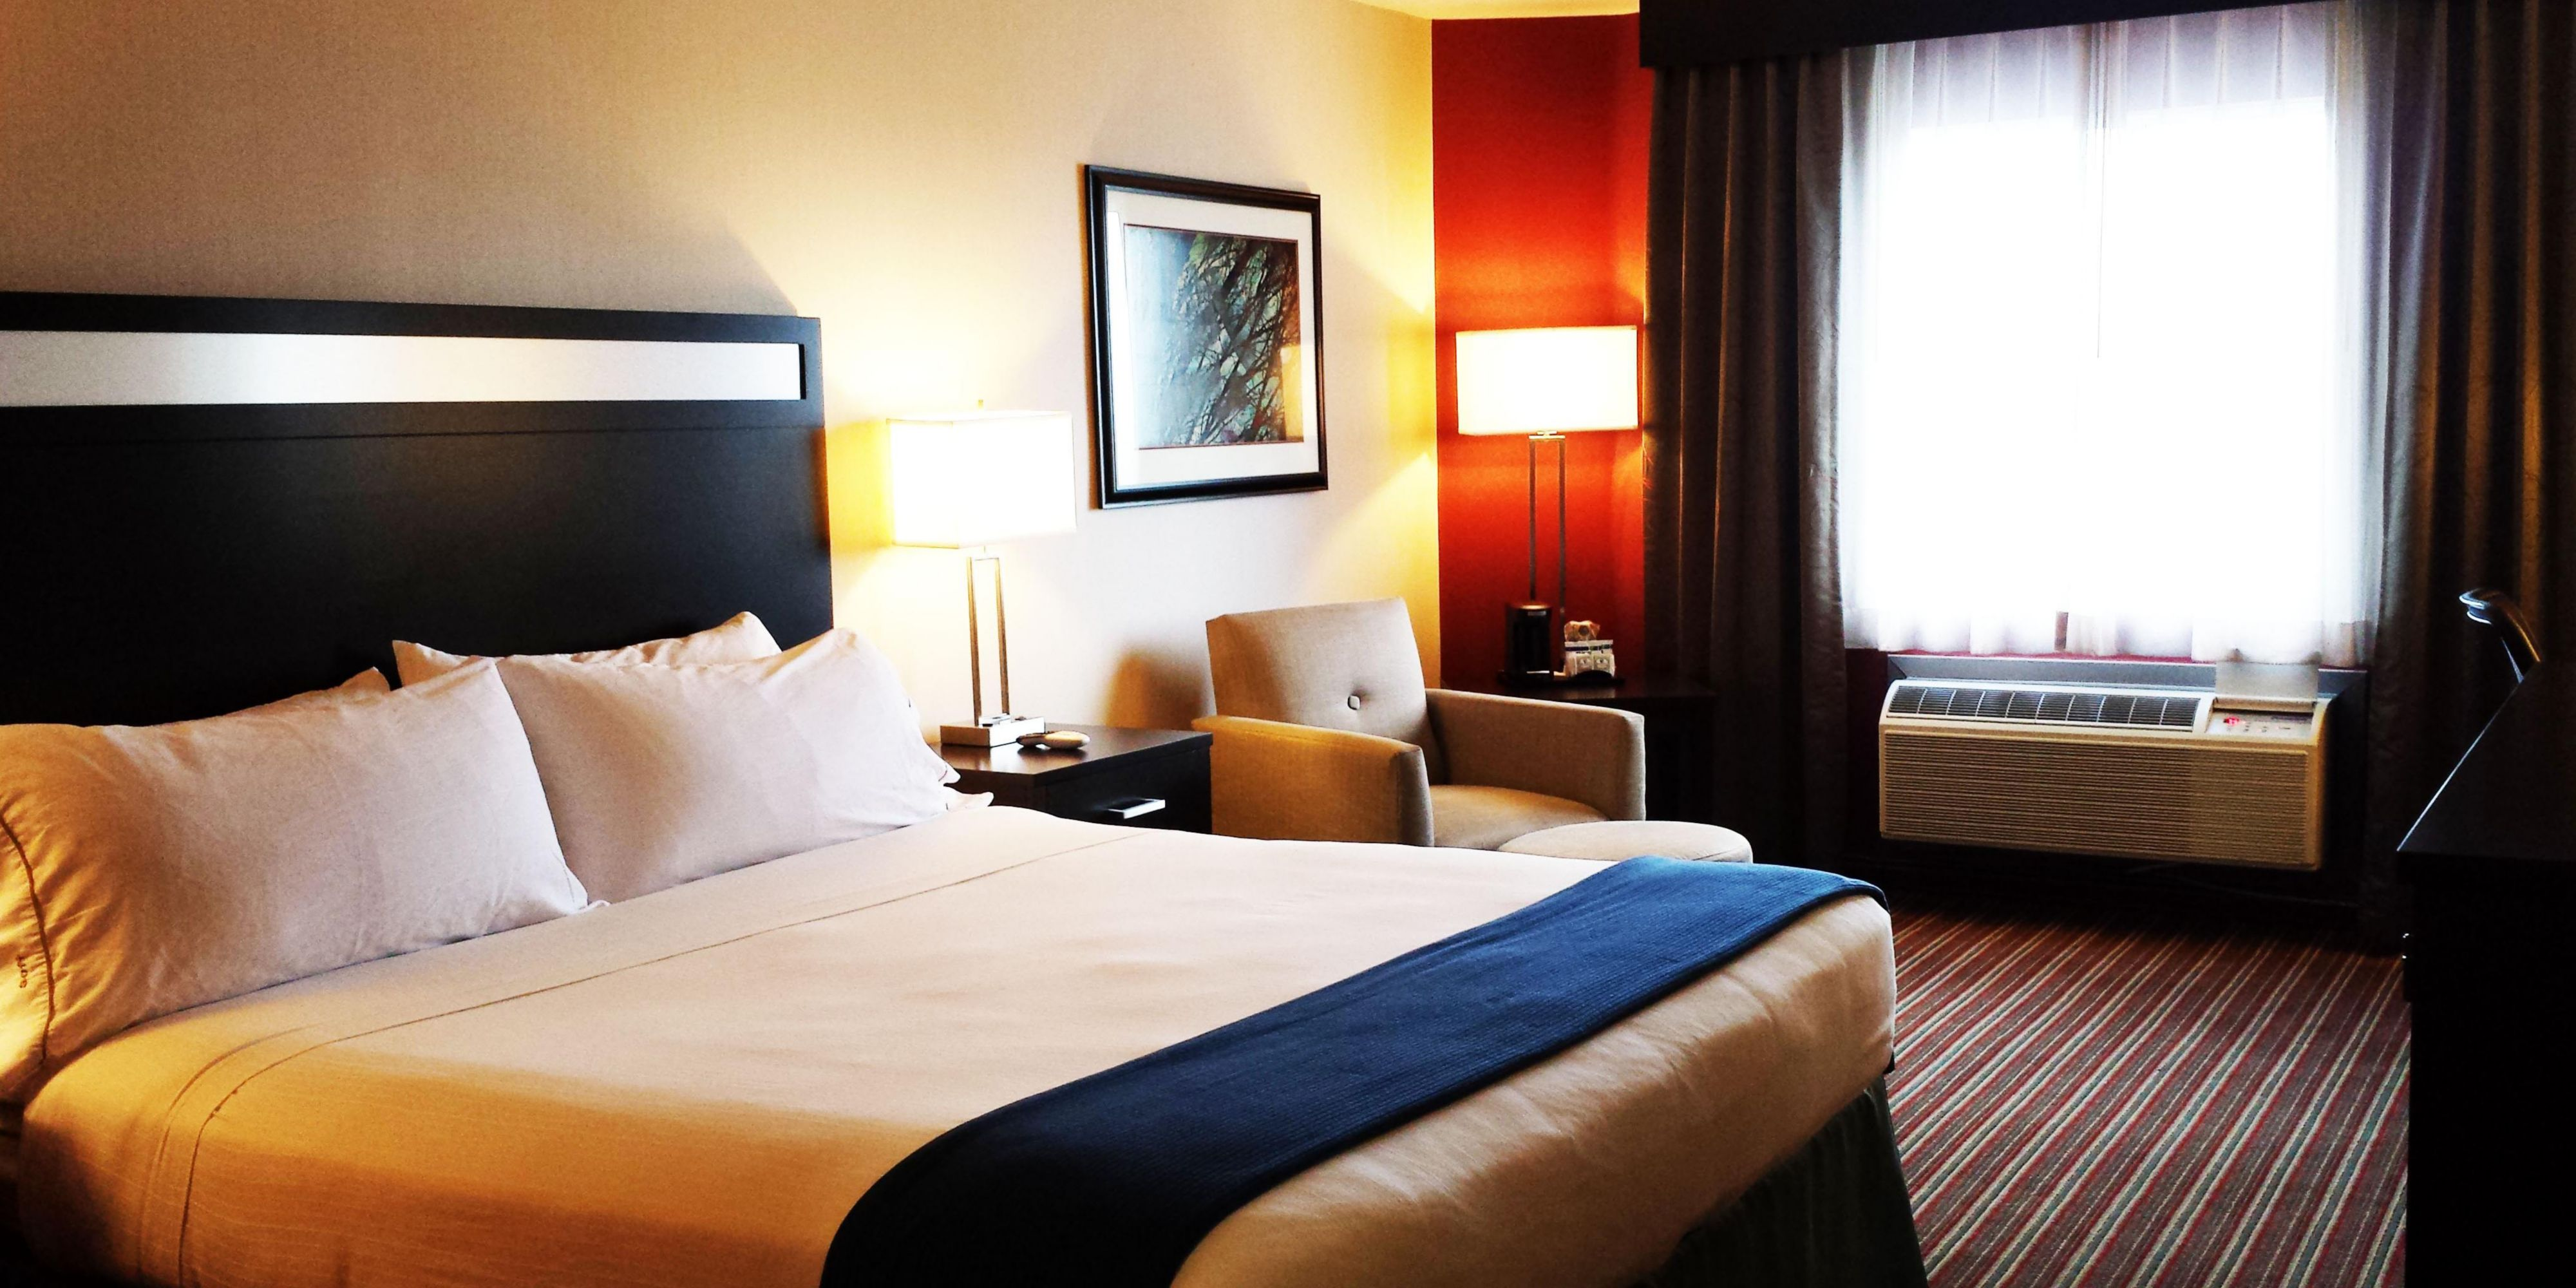 Holiday Inn Express Bakersfield 2798863203 2x1